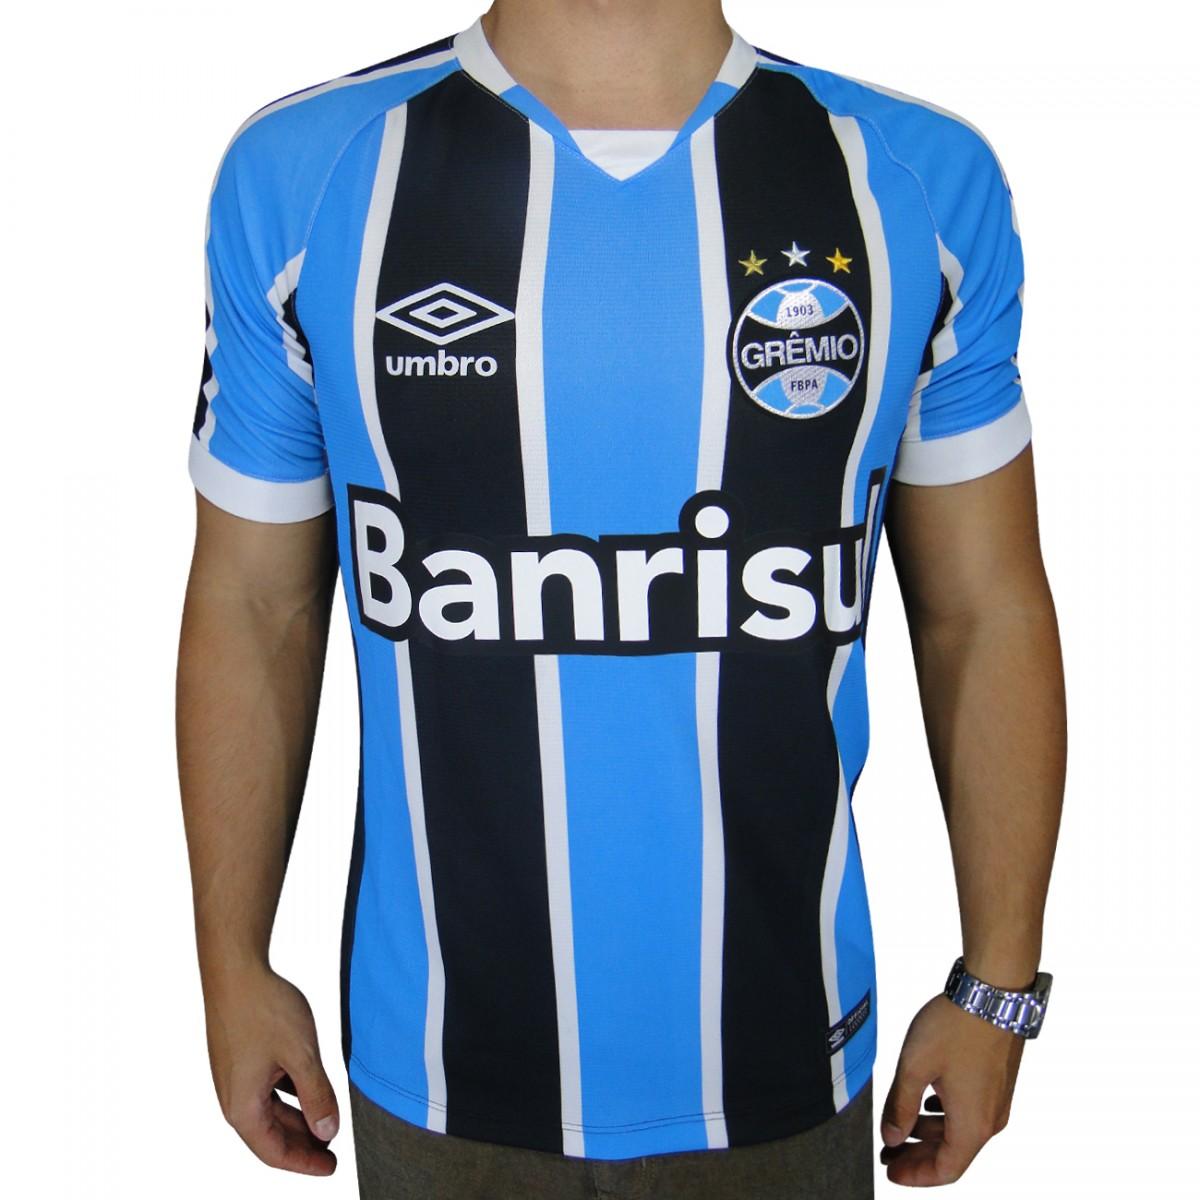 Camisa Gremio Umbro 2016 644562 - Tricolor - Chuteira Nike 08c7c28d154be